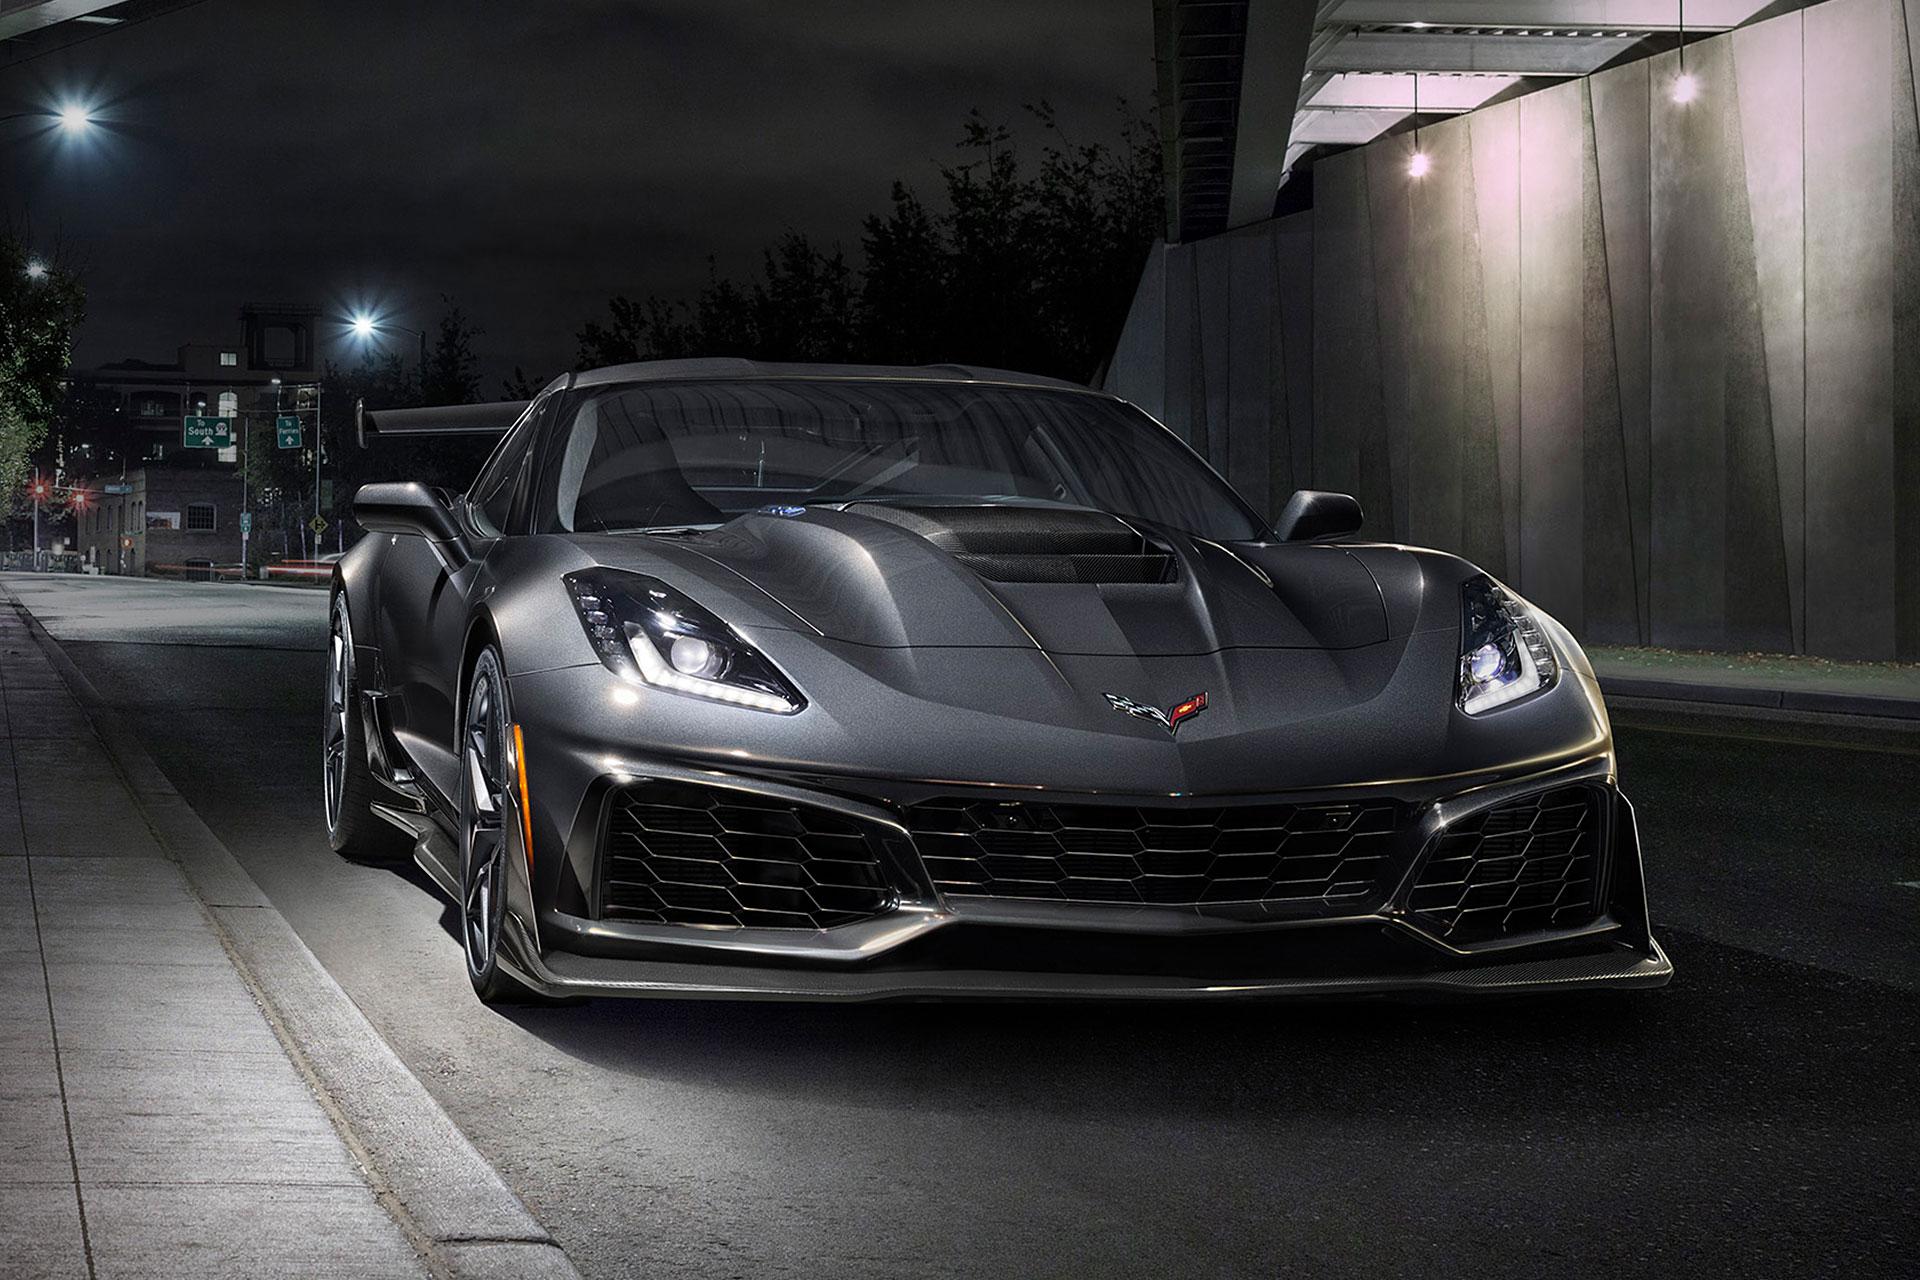 2019 Corvette Zr1 Uncrate